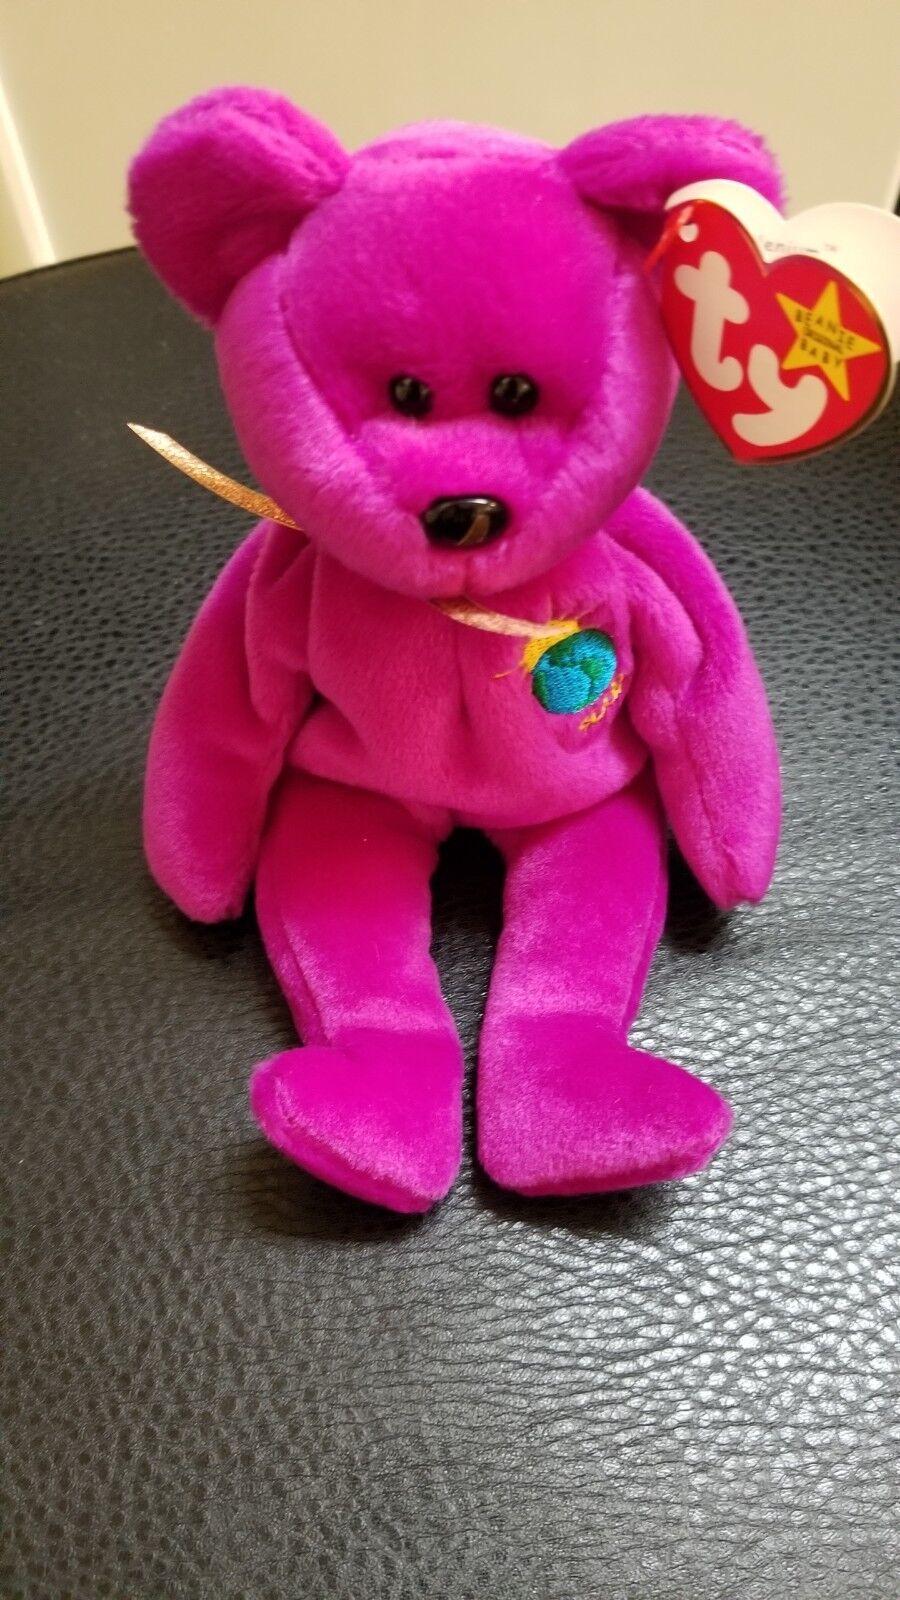 Authenticated Rare 1991 TY Beanie Baby - MILLENNIUM the Bear Bear the w  errors 0ab339 a20860611466